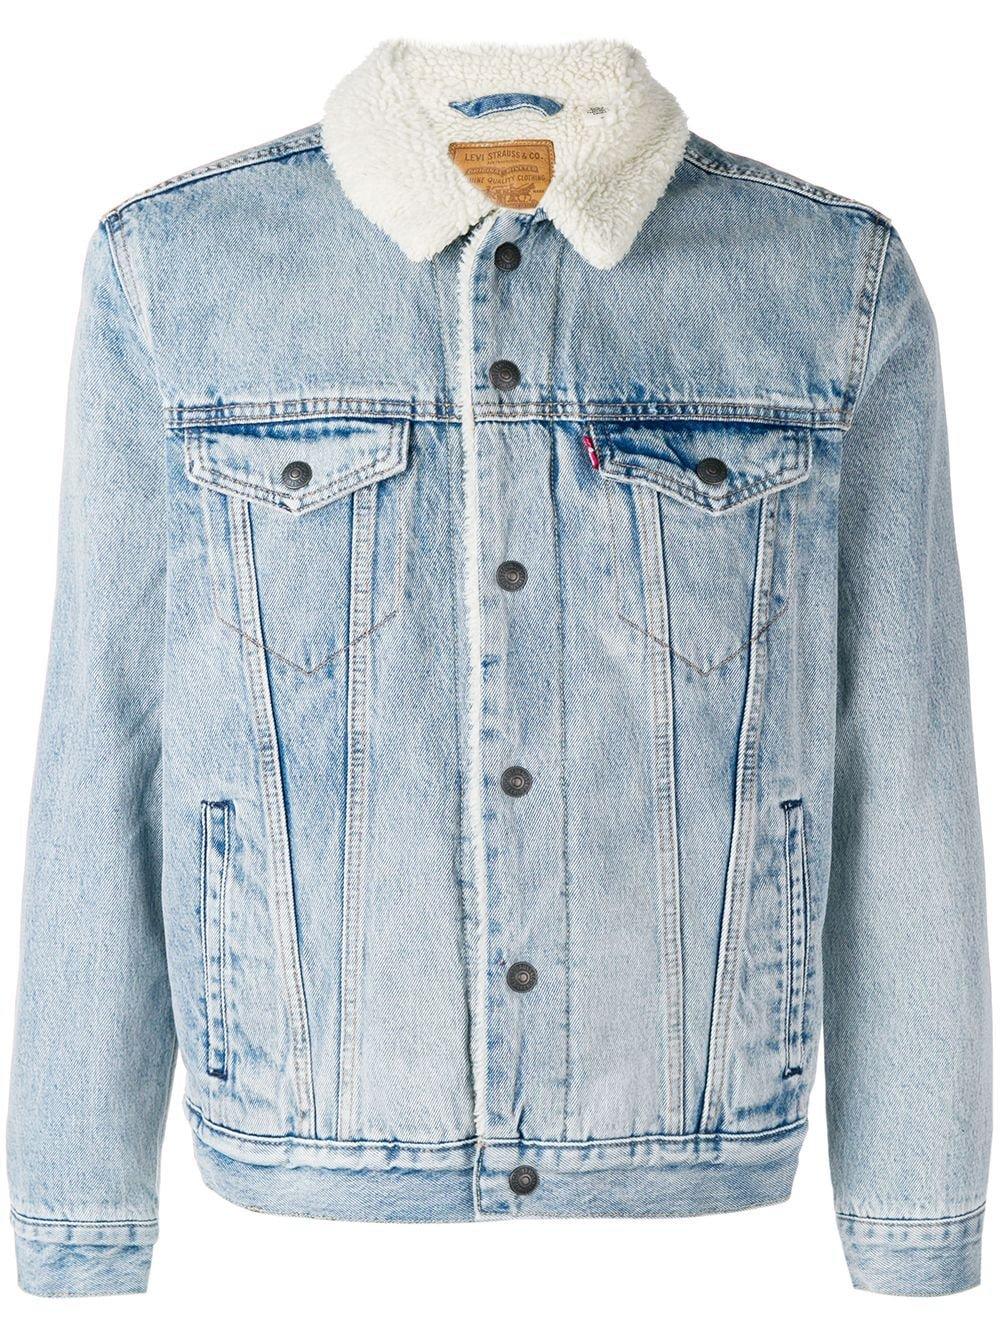 Levi's Sherpa Trucker jacket £126 - Shop Online - Fast Global Shipping, Price